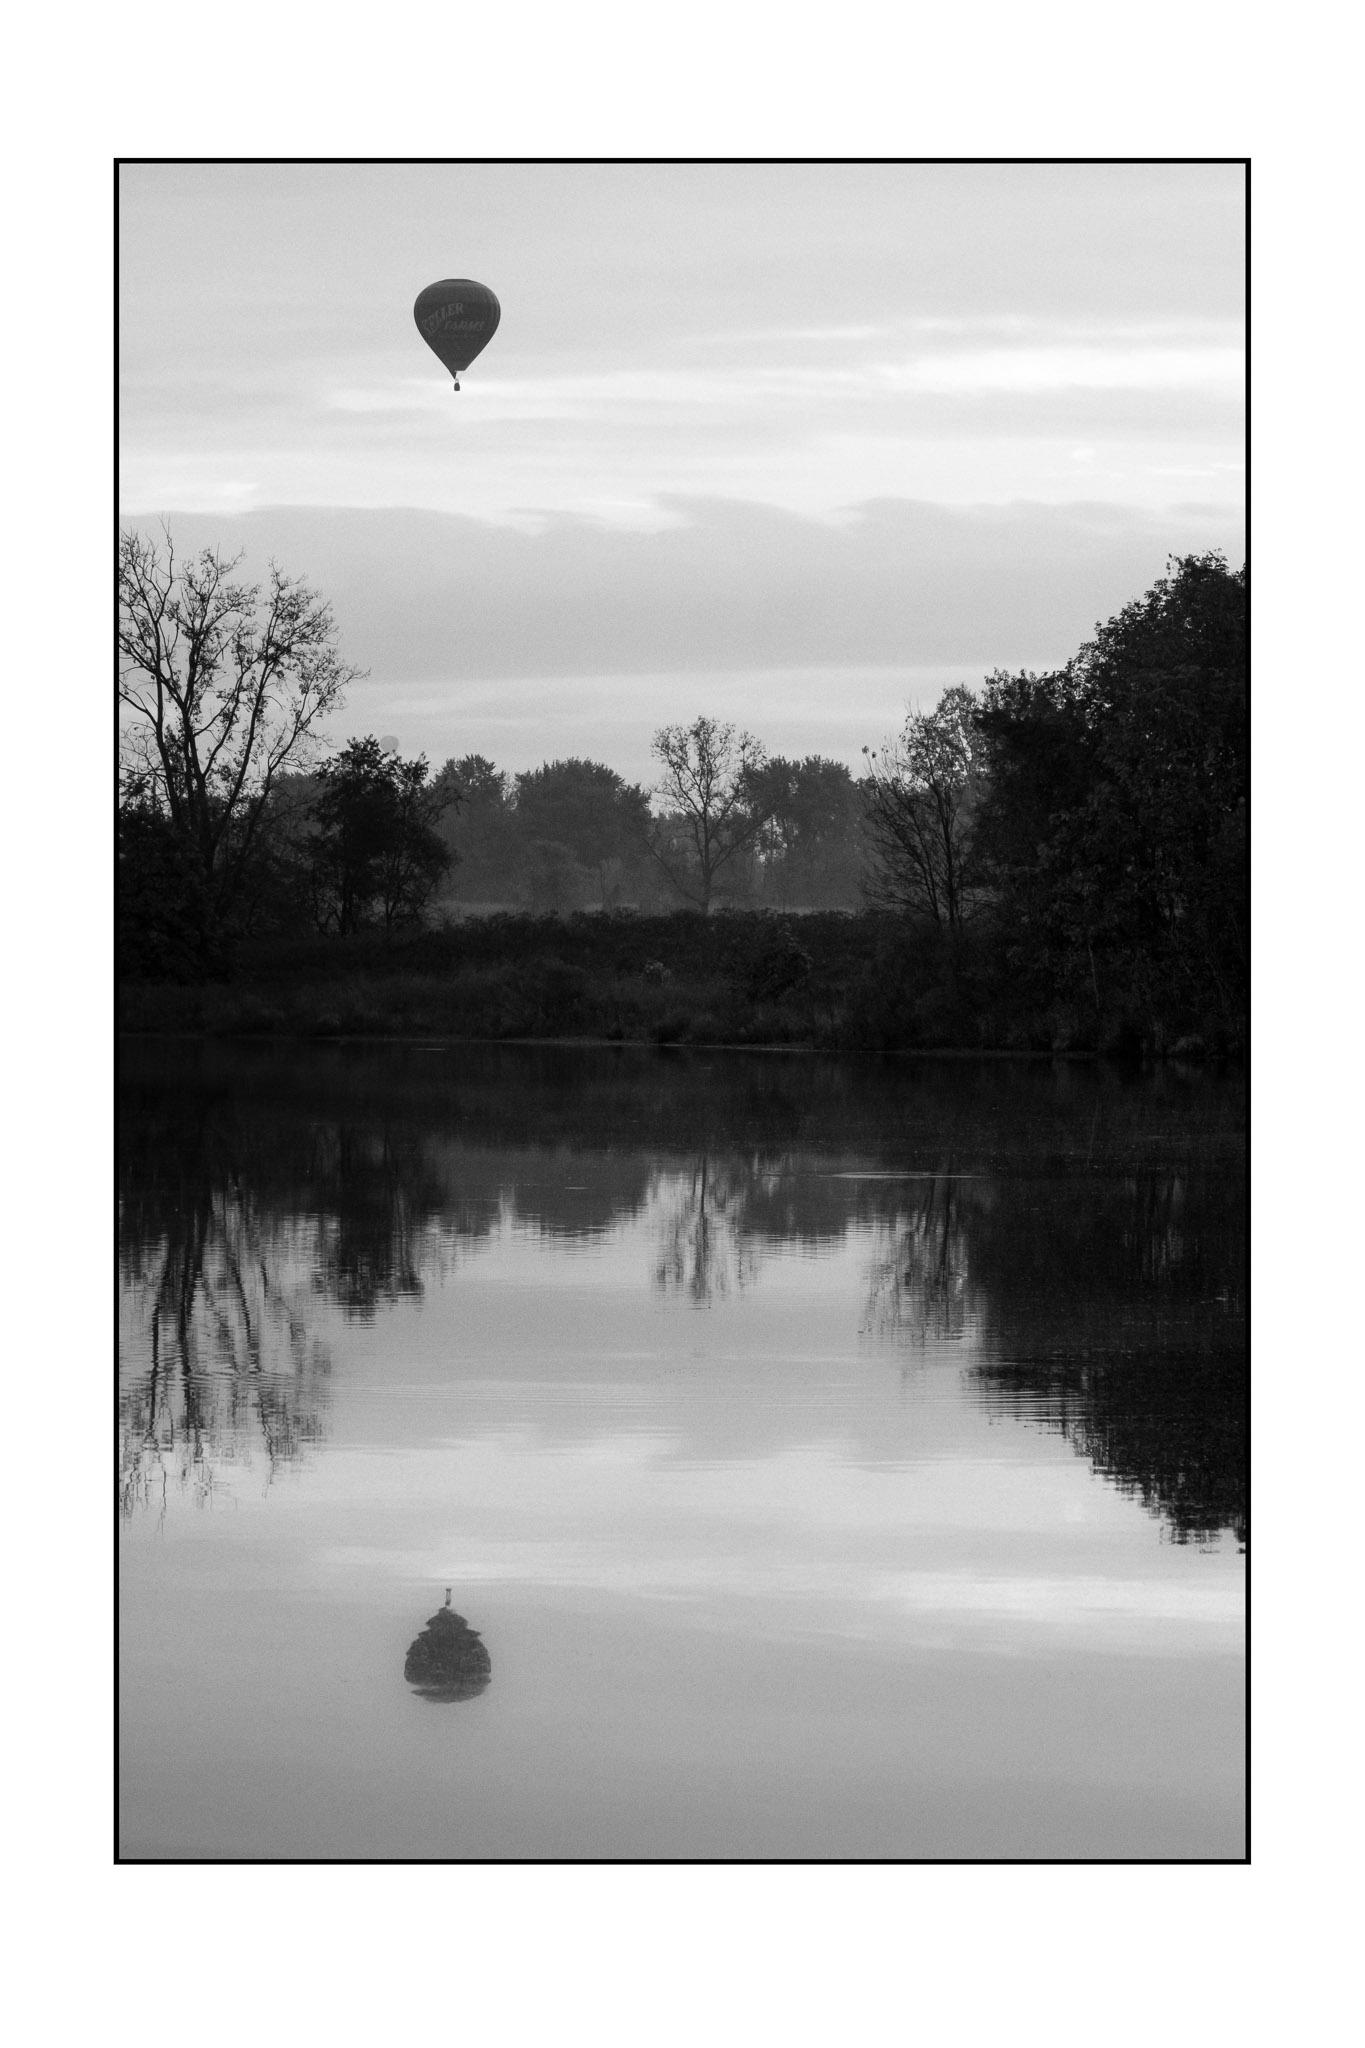 Pickerington Ponds Metropark, Ohio, USA (2013)